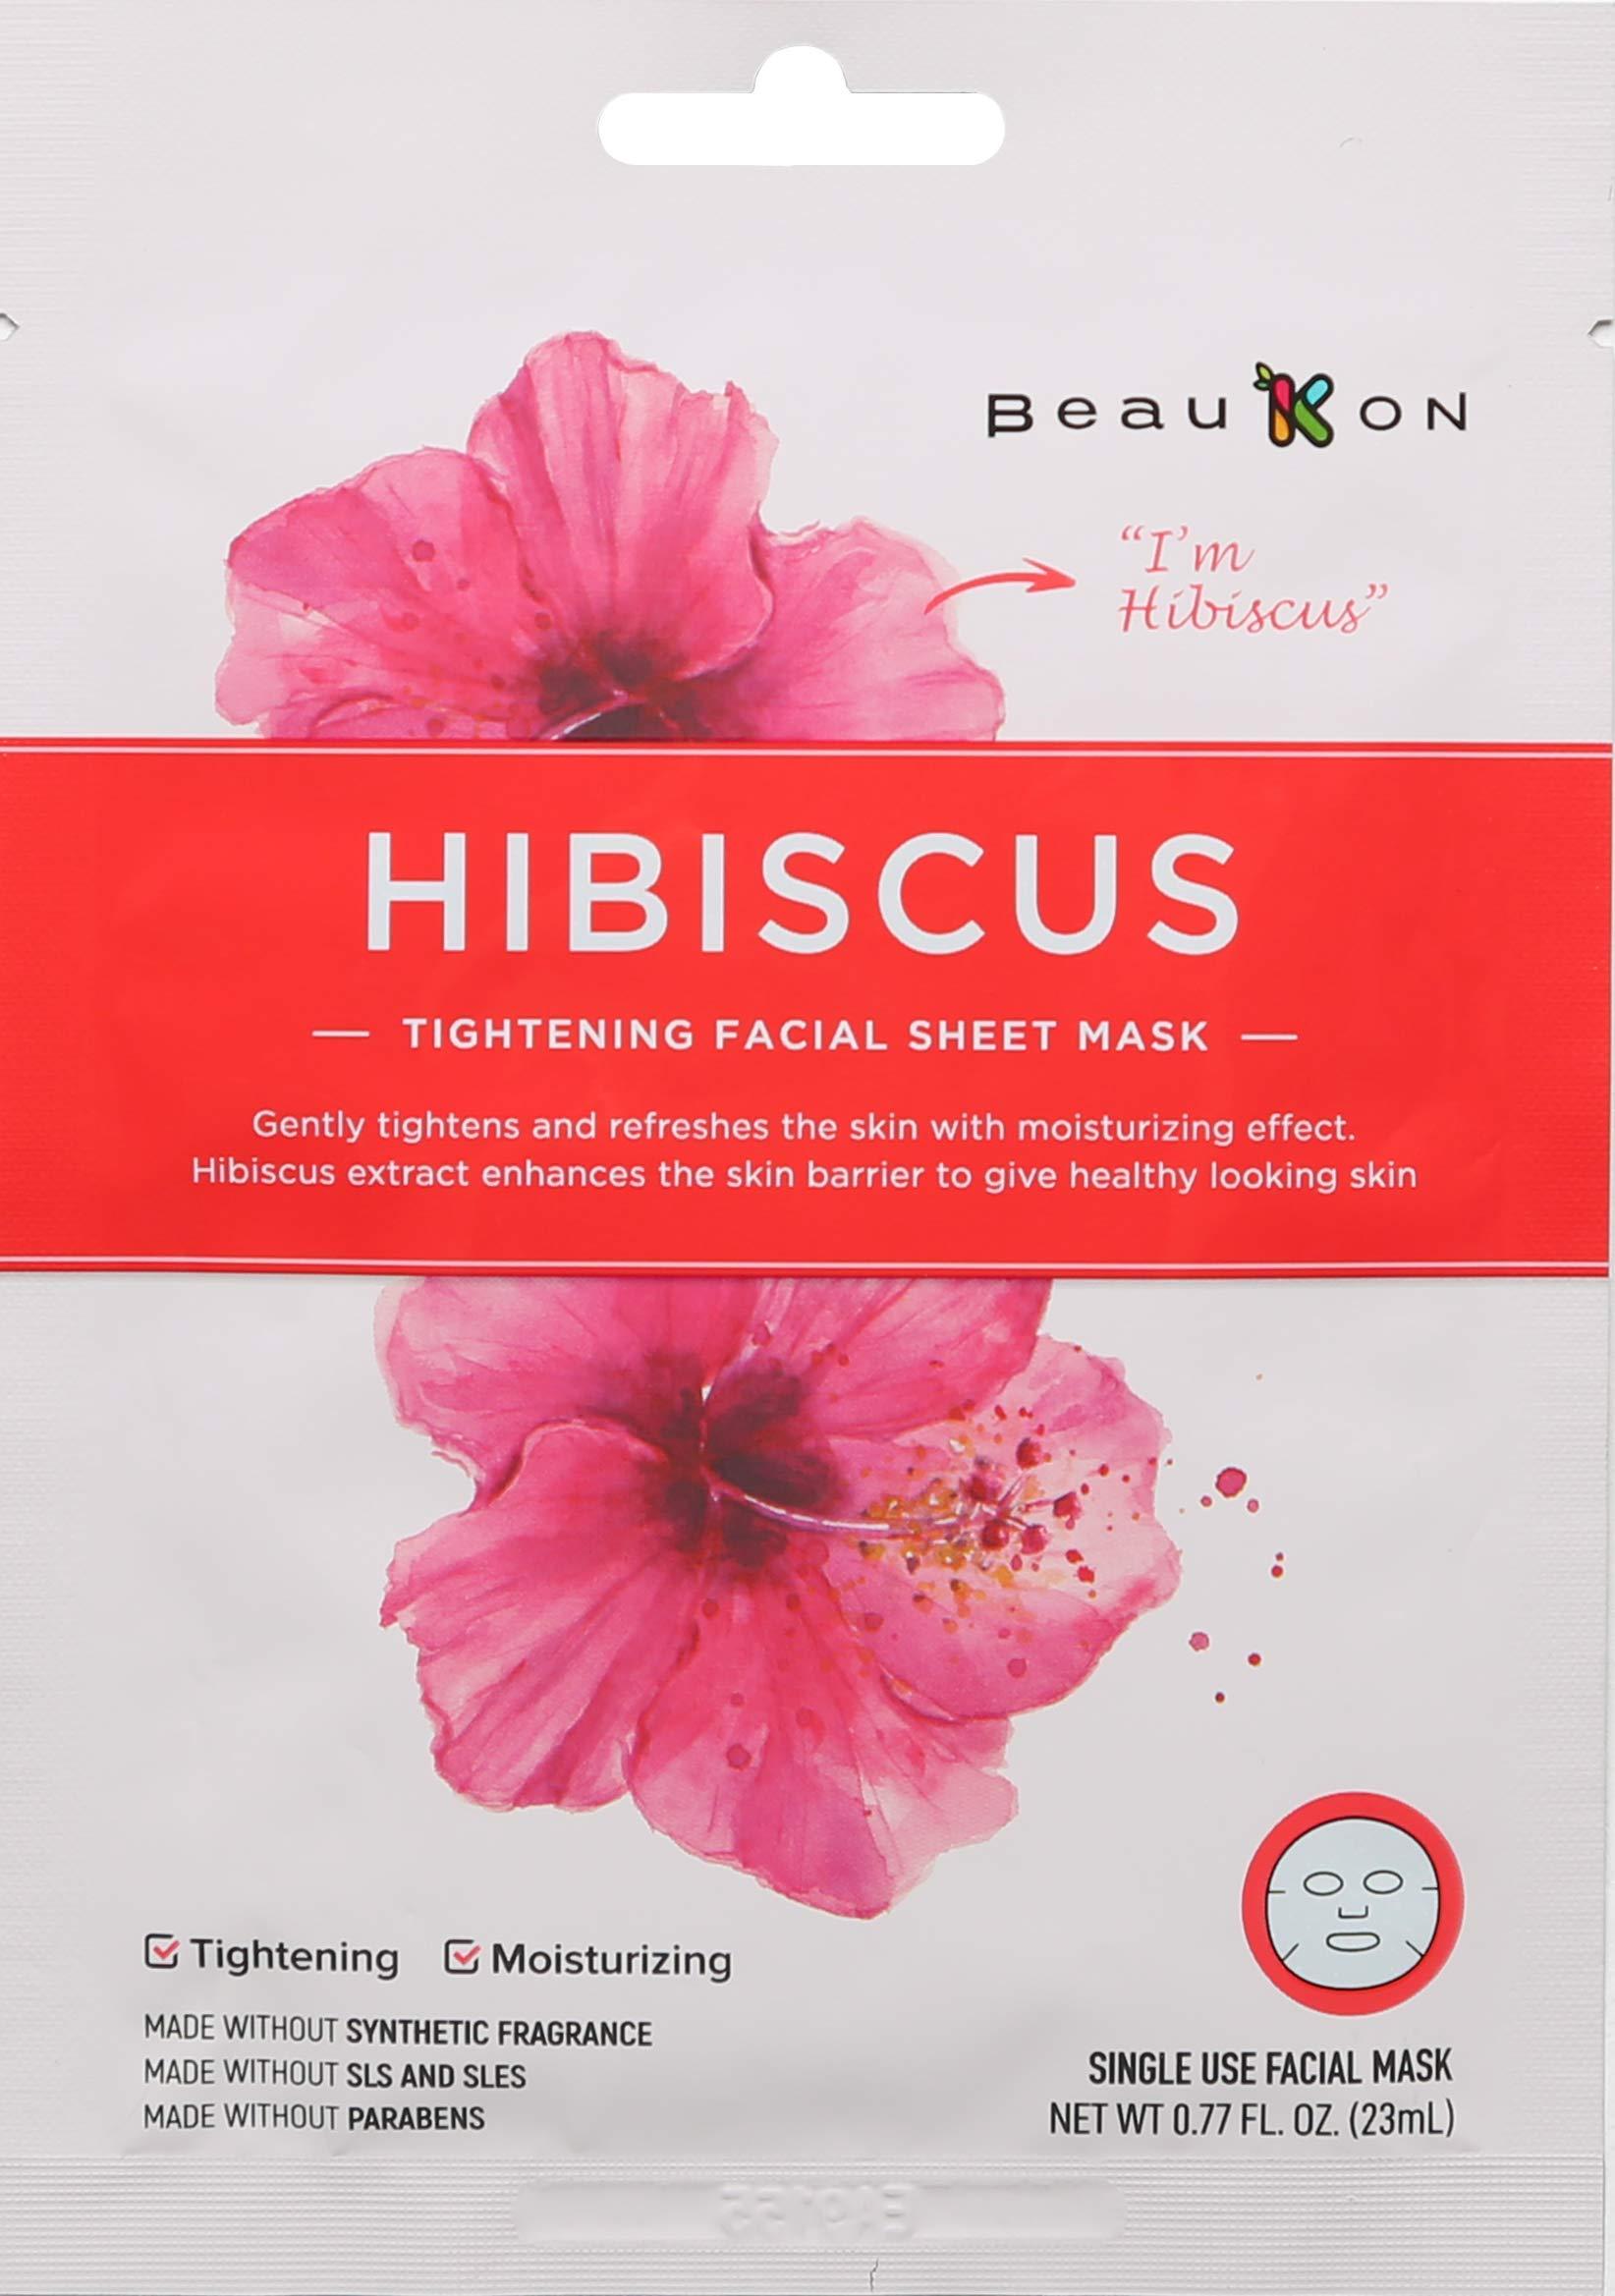 BeauKON Hibiscus Tightening Facial Sheet Mask, Korean Daily Face Mask, Tightening and Moisturizing (4 Pack)